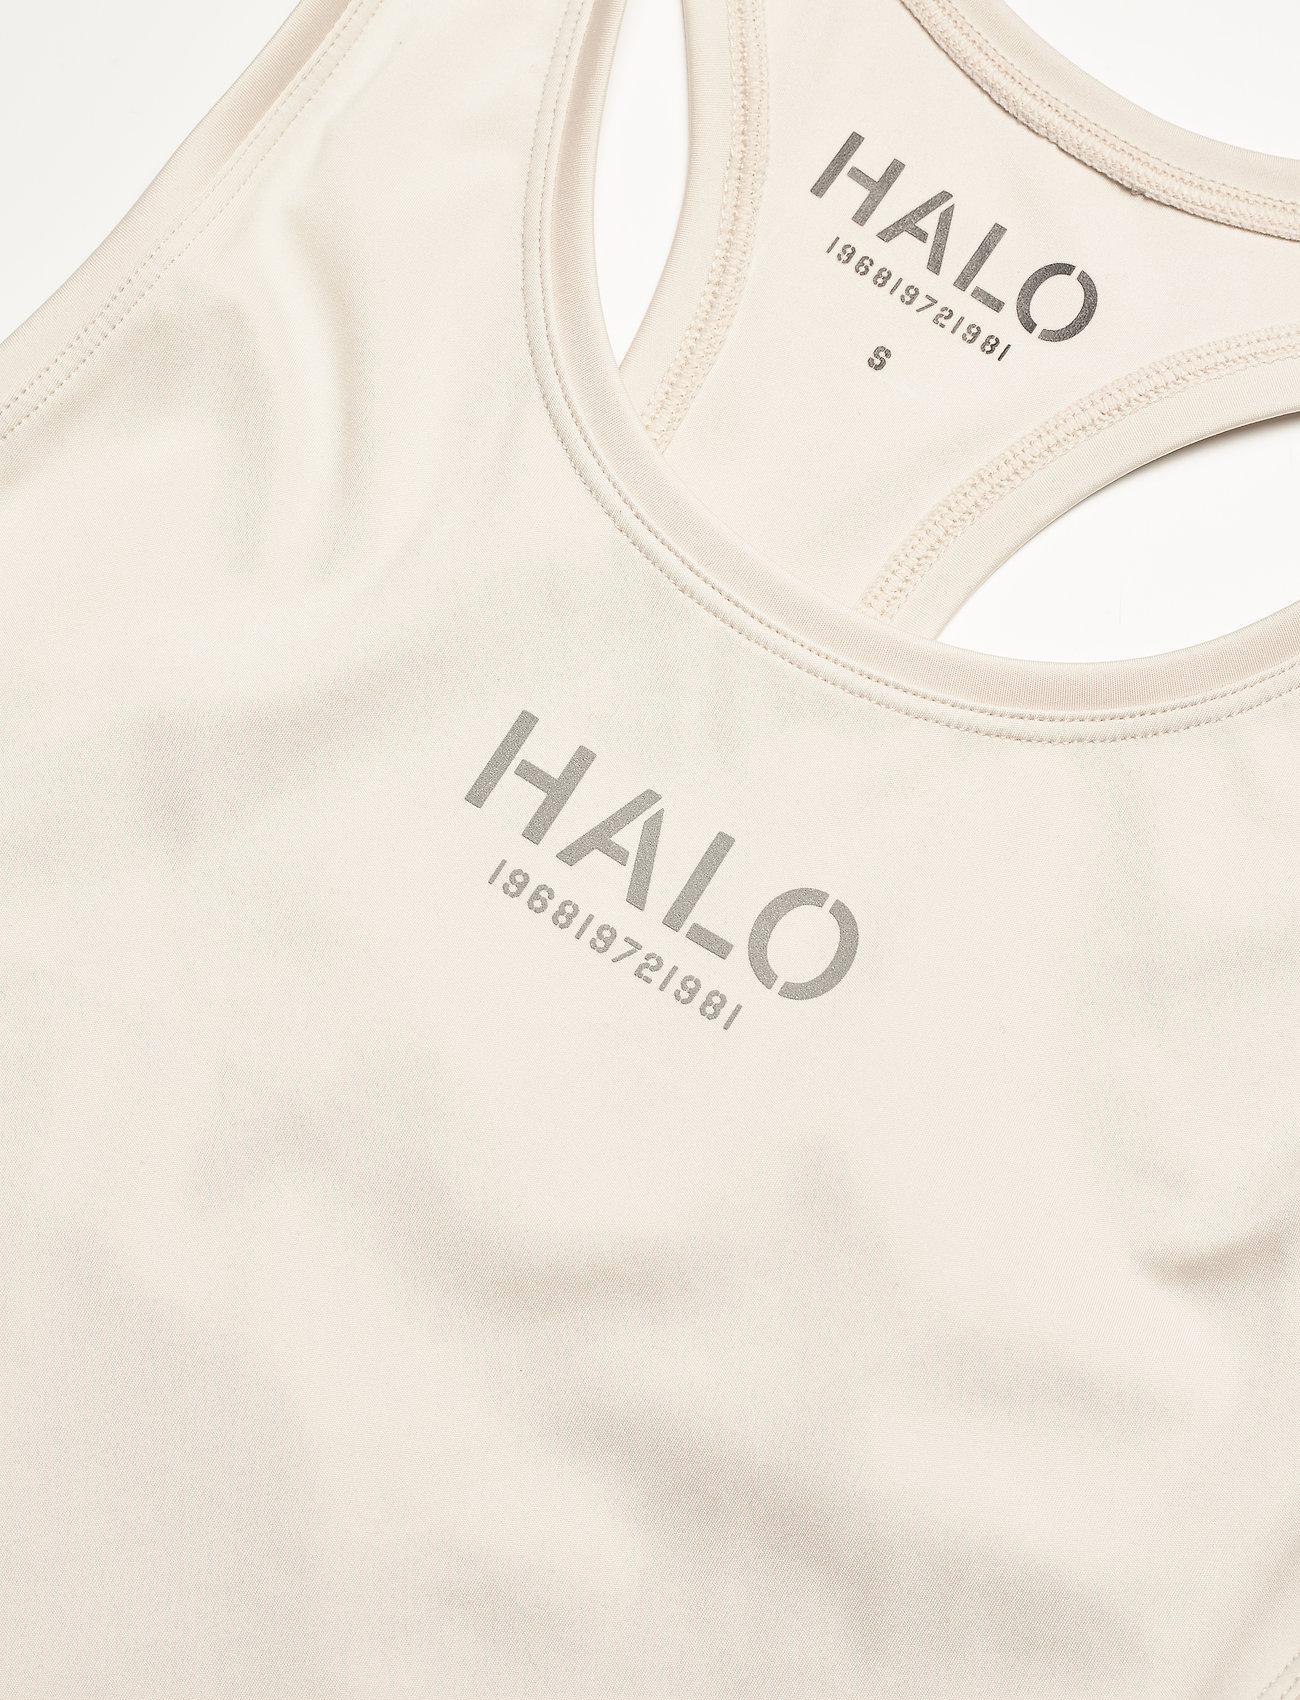 HALO - HALO WOMENS RACERBACK TANK - toppar & t-shirts - pumice stone - 3